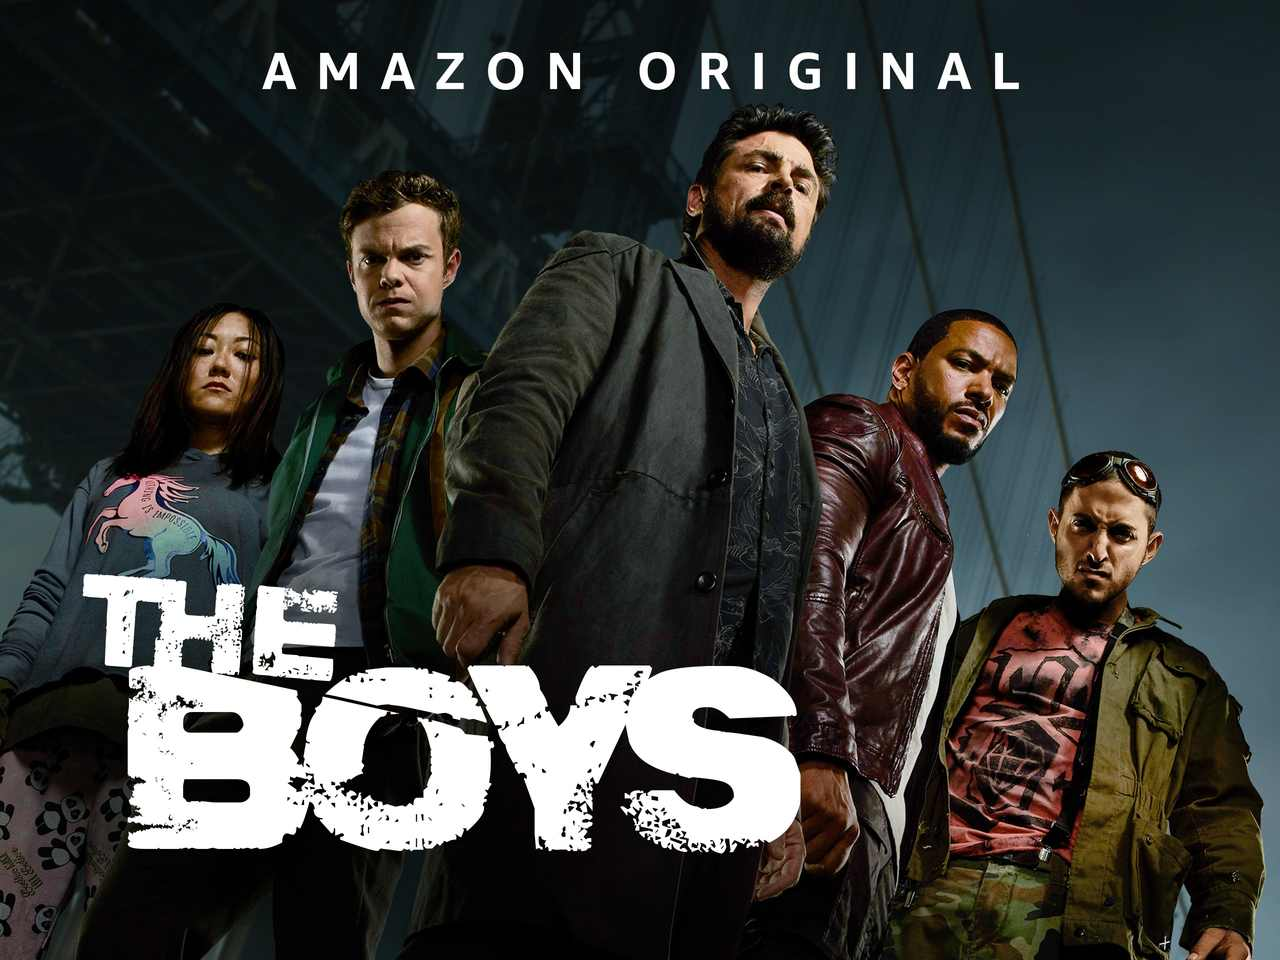 the boys recenzja serialu amazona